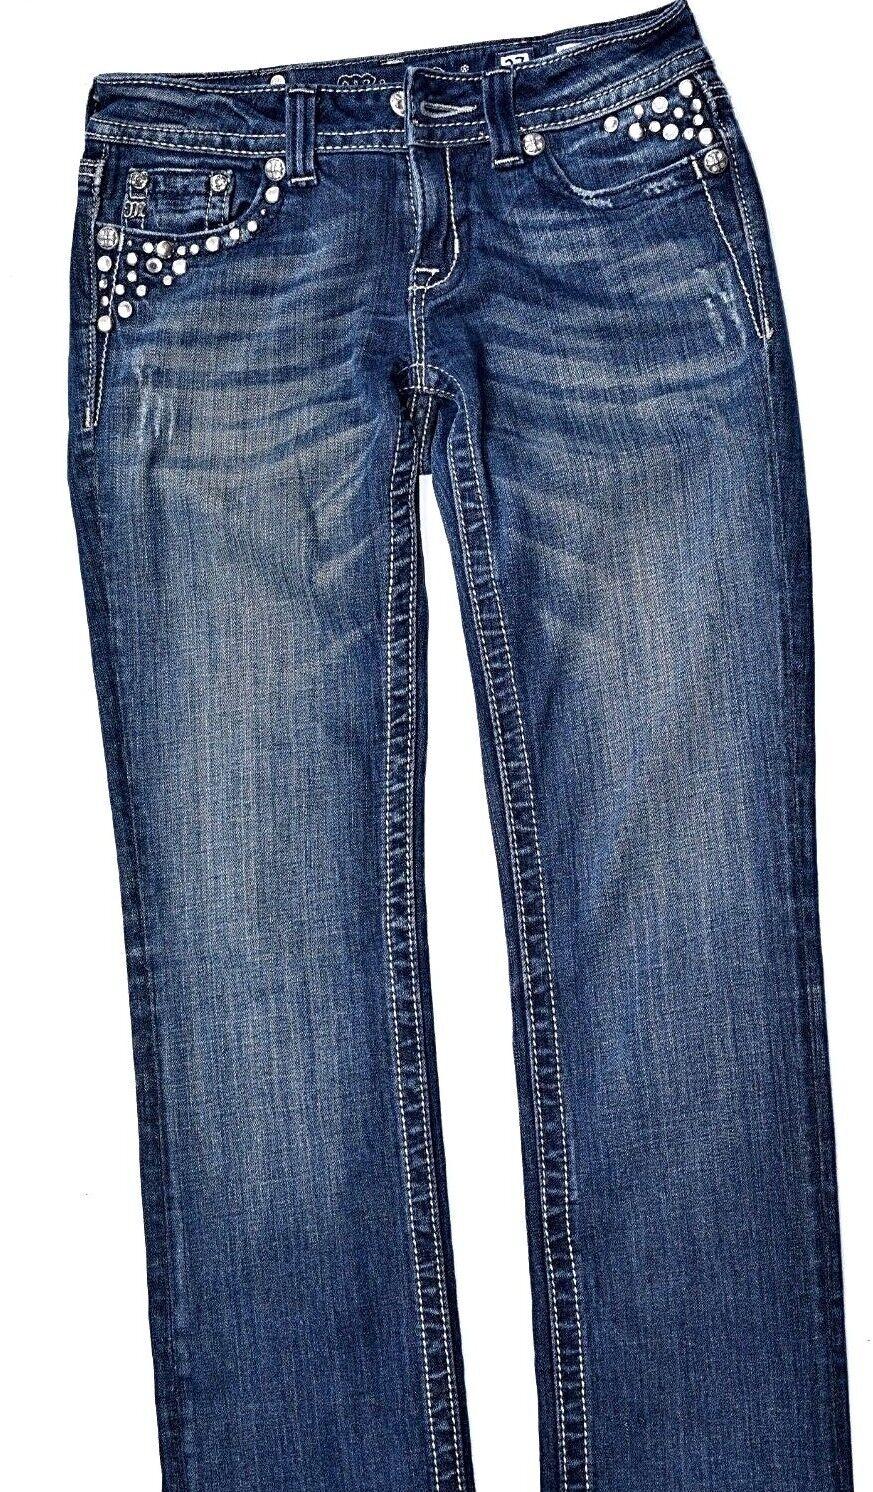 Miss Me Jeans Embellished Womens Size 27 Straight BLING Denim Women bluee Flap